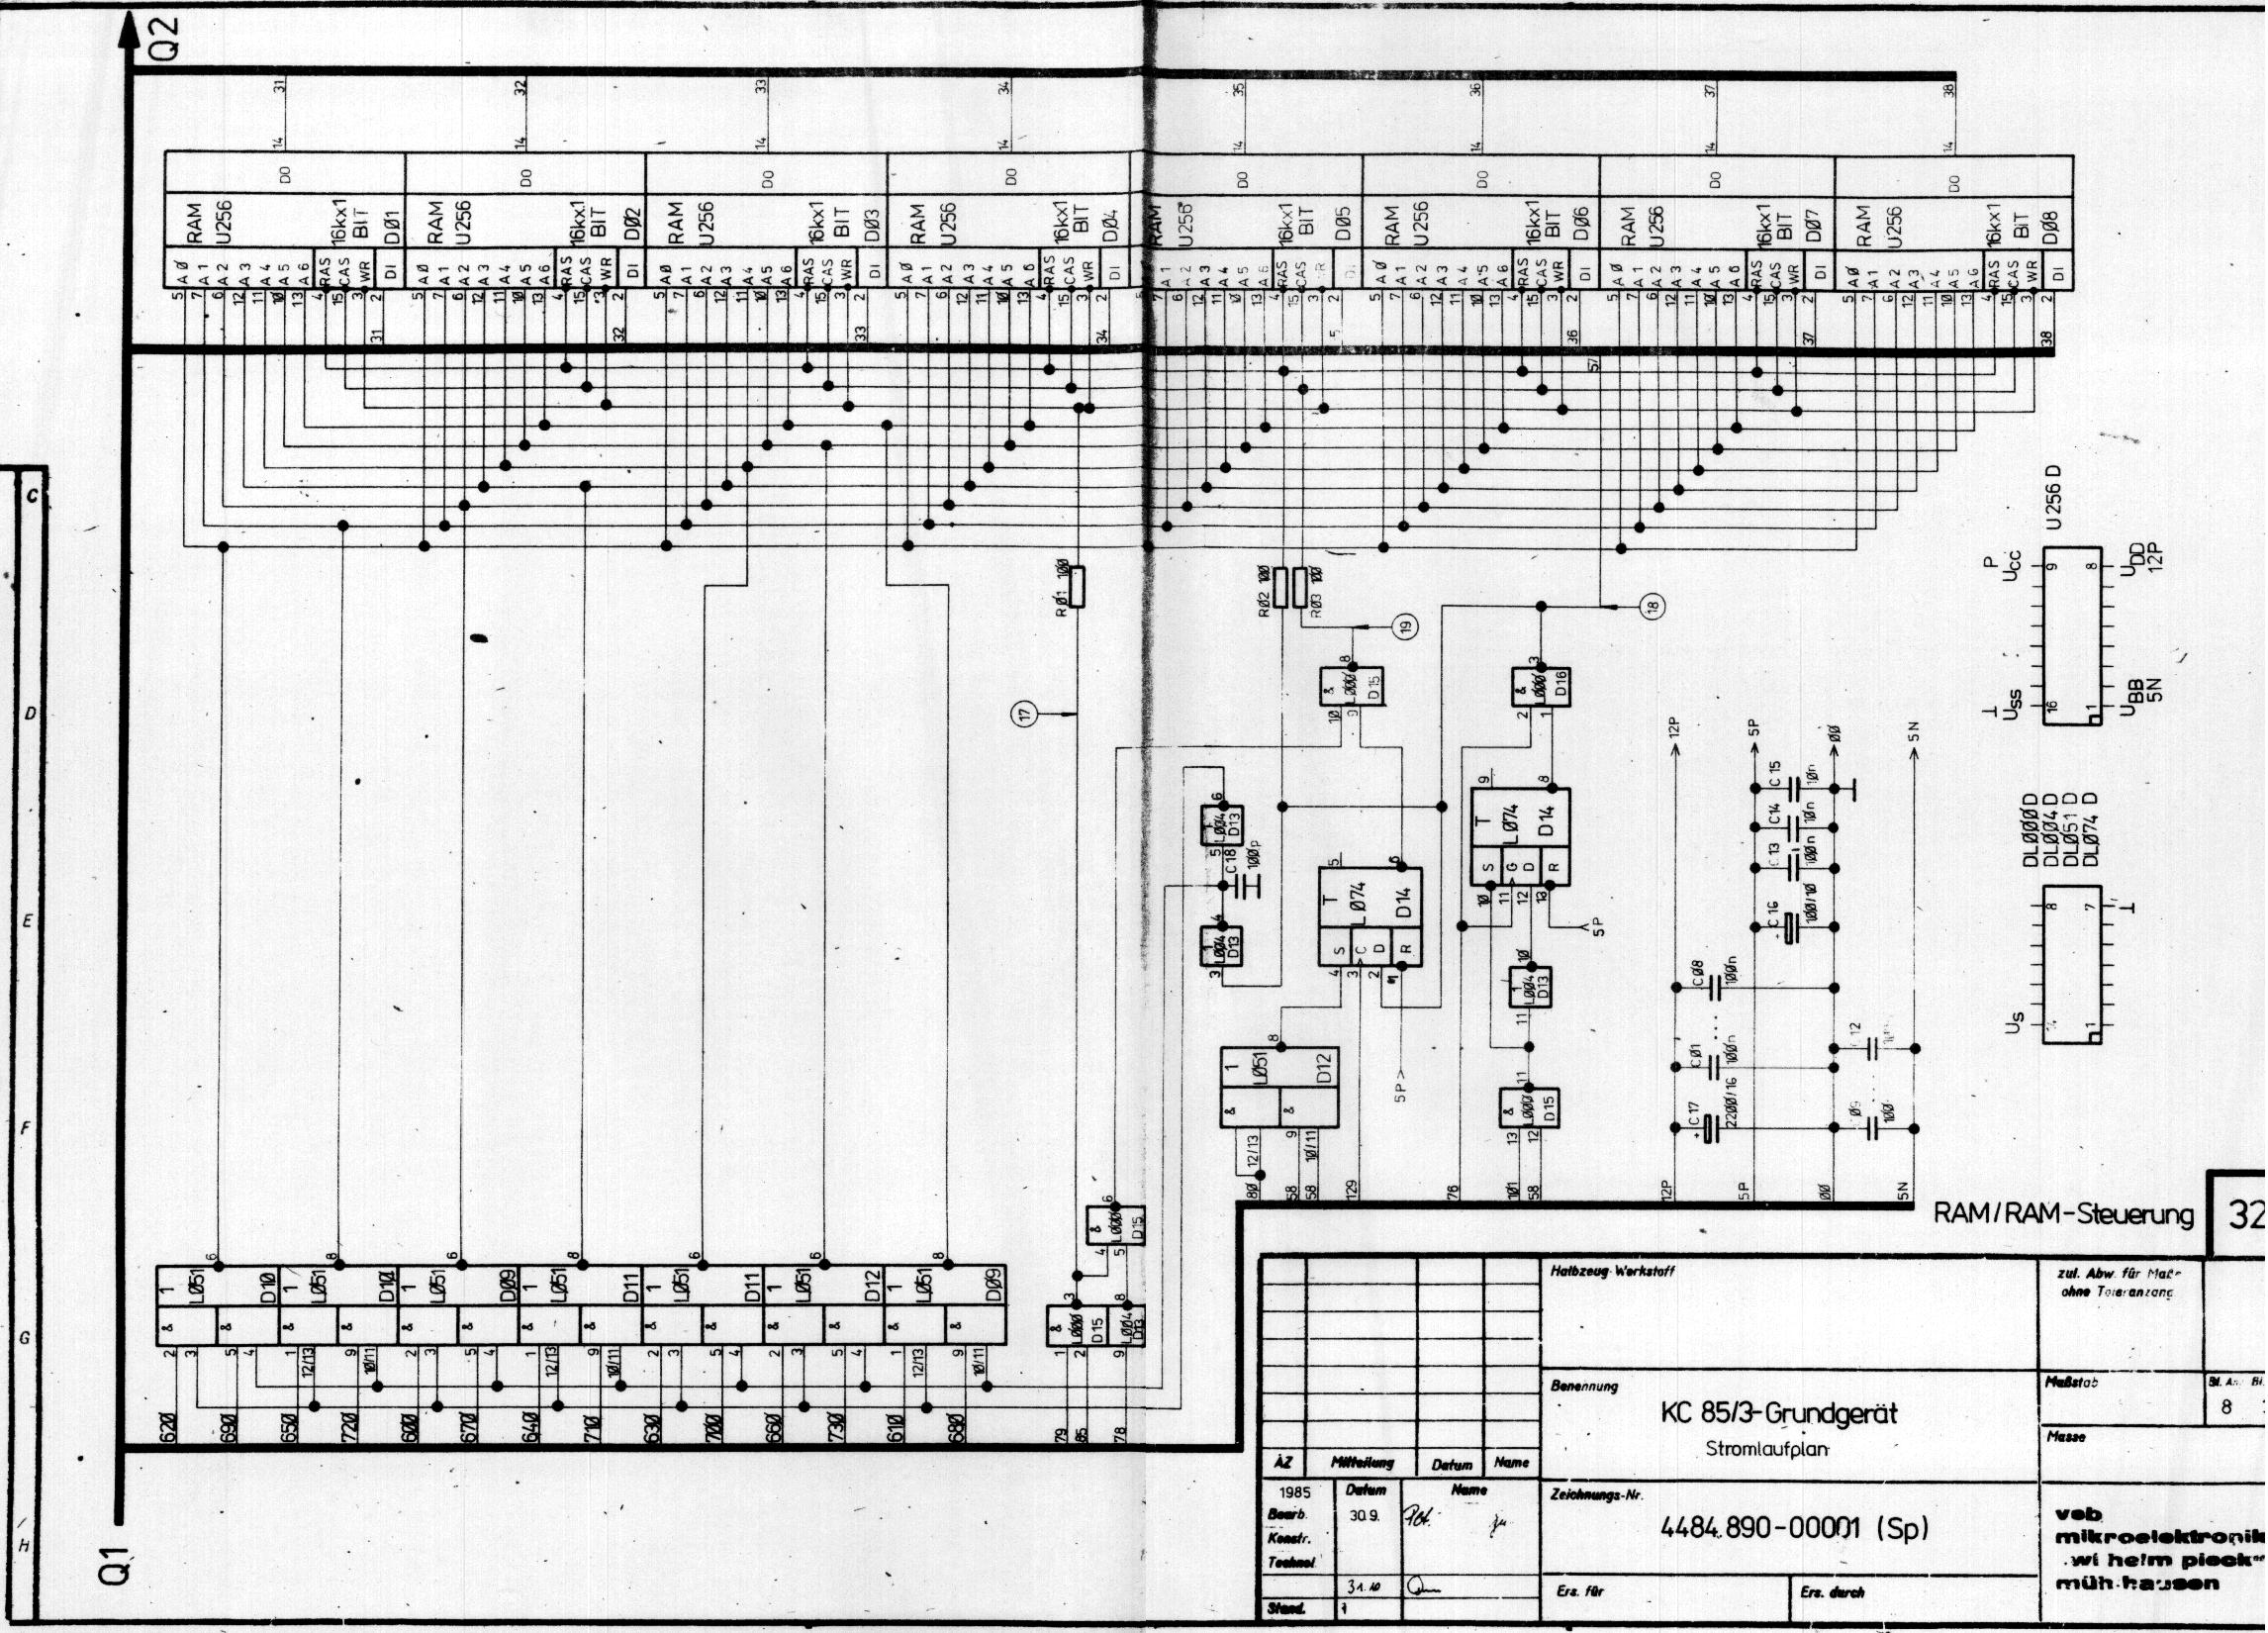 Beste Ram Lkw Schaltplan Galerie - Der Schaltplan - greigo.com